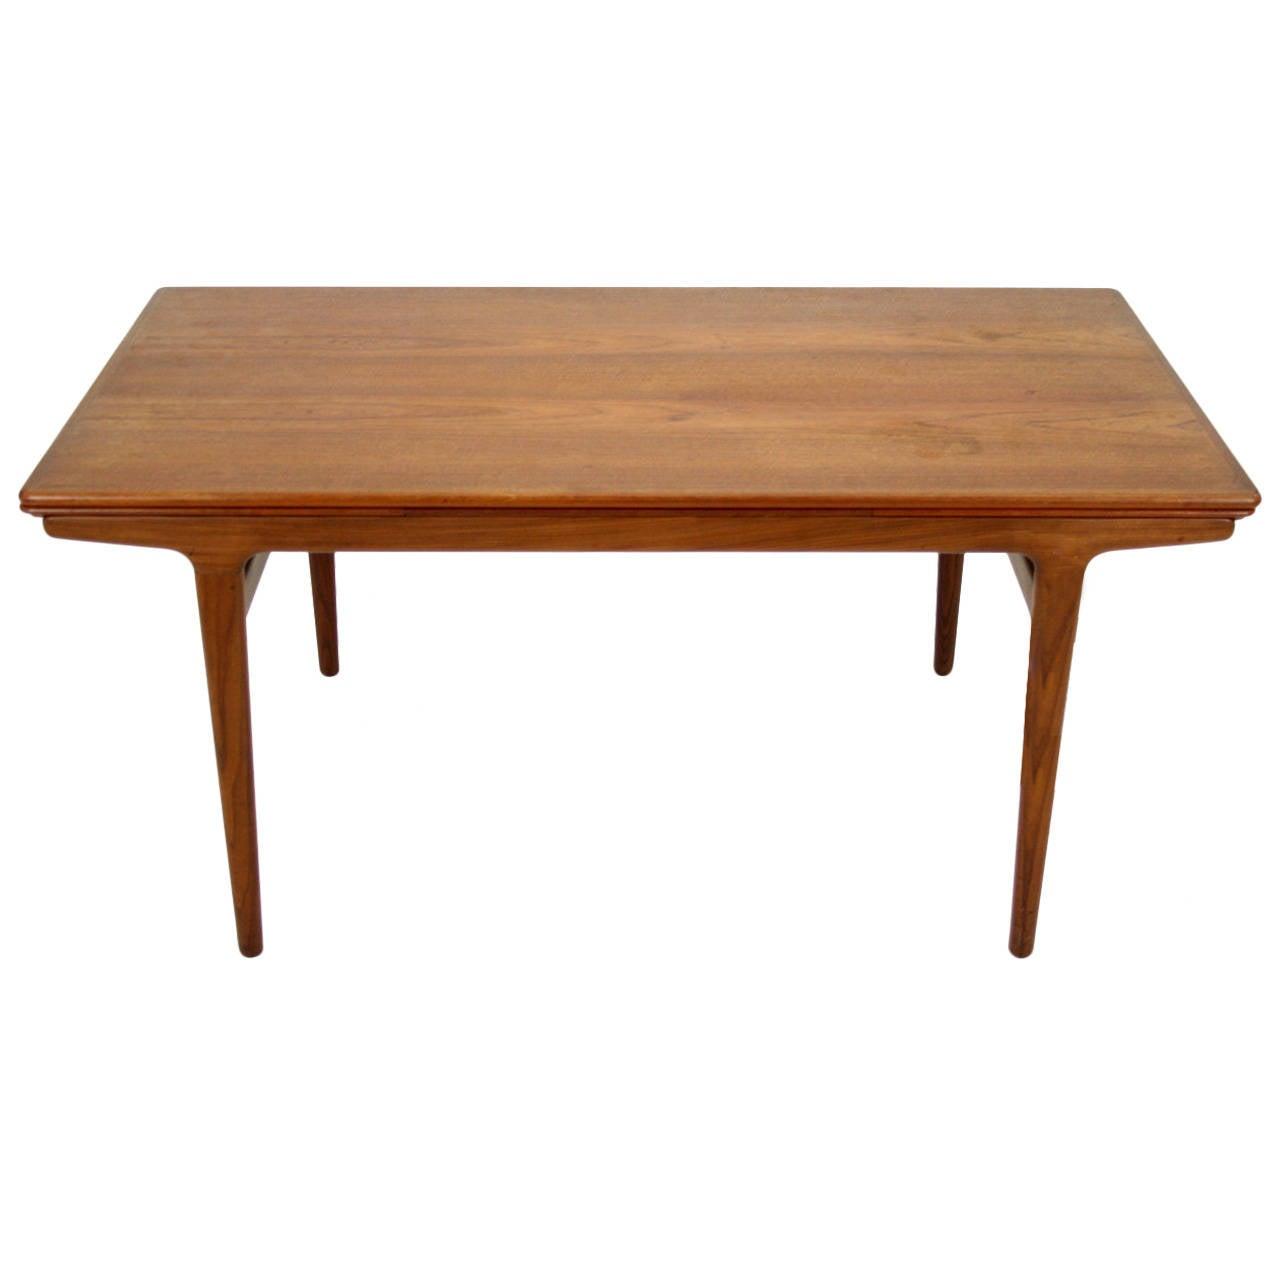 Danish Mid Century Modern Teak Dining Table By Johannes